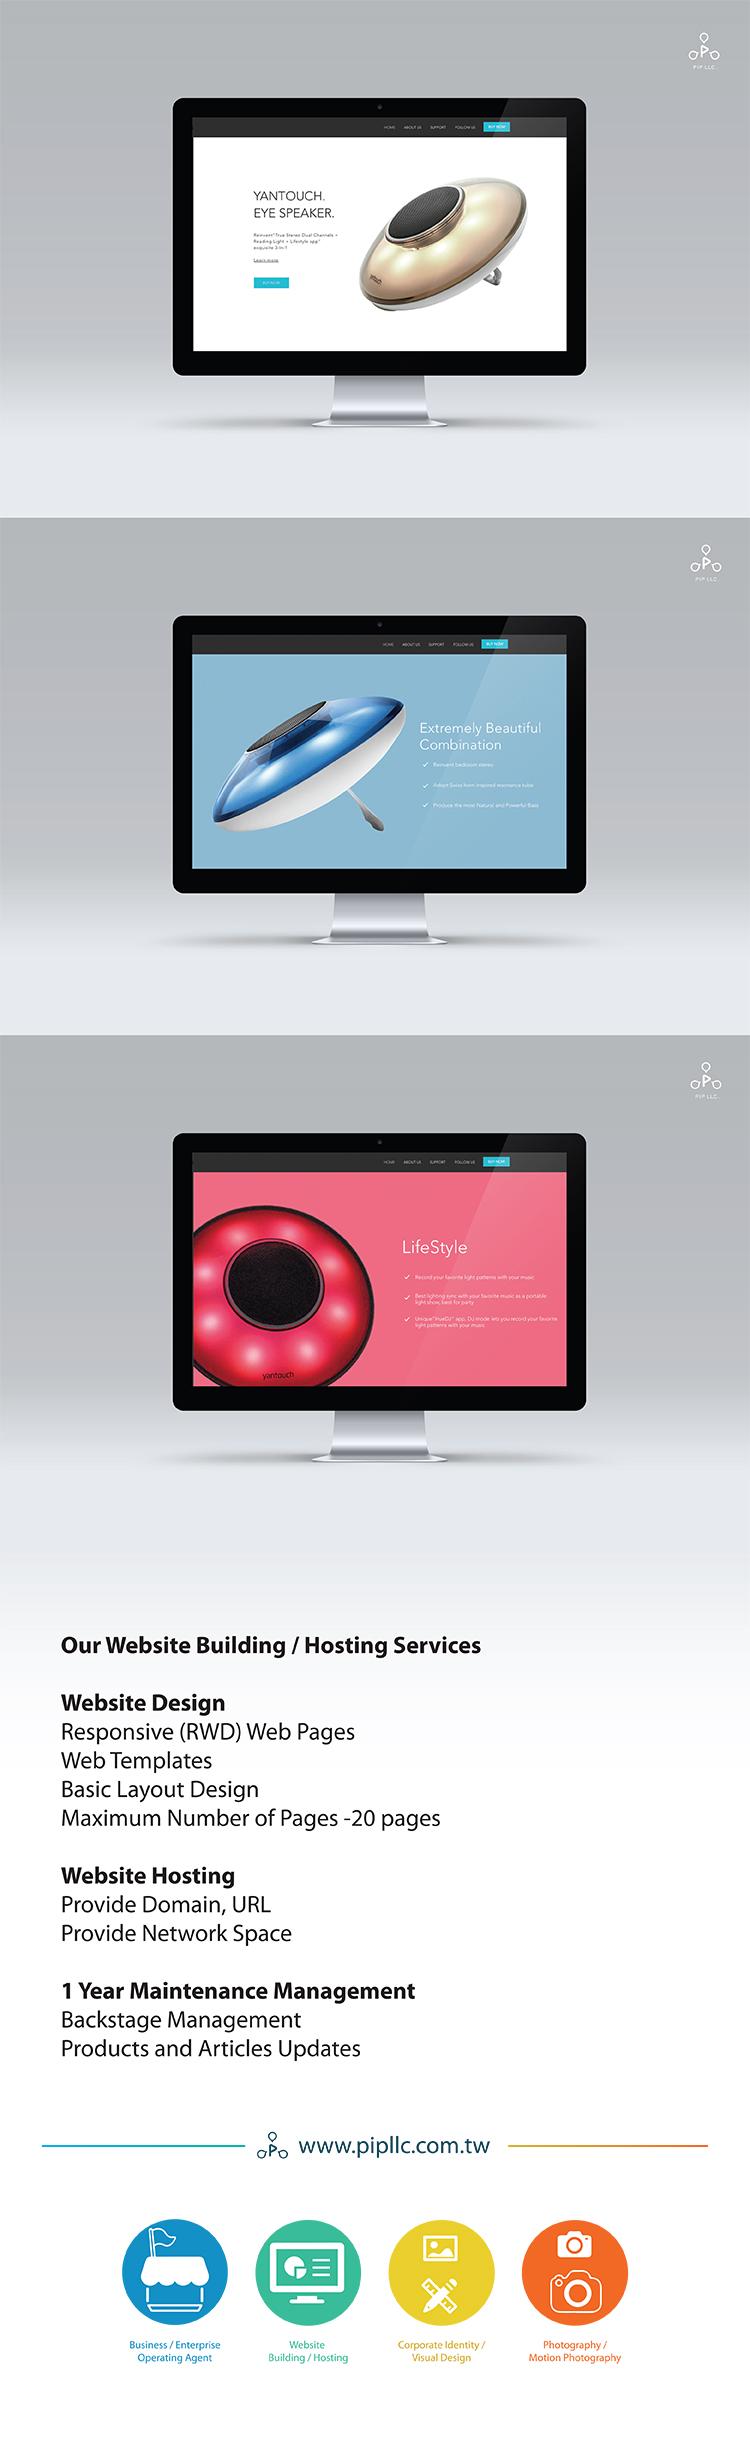 pip-website-service